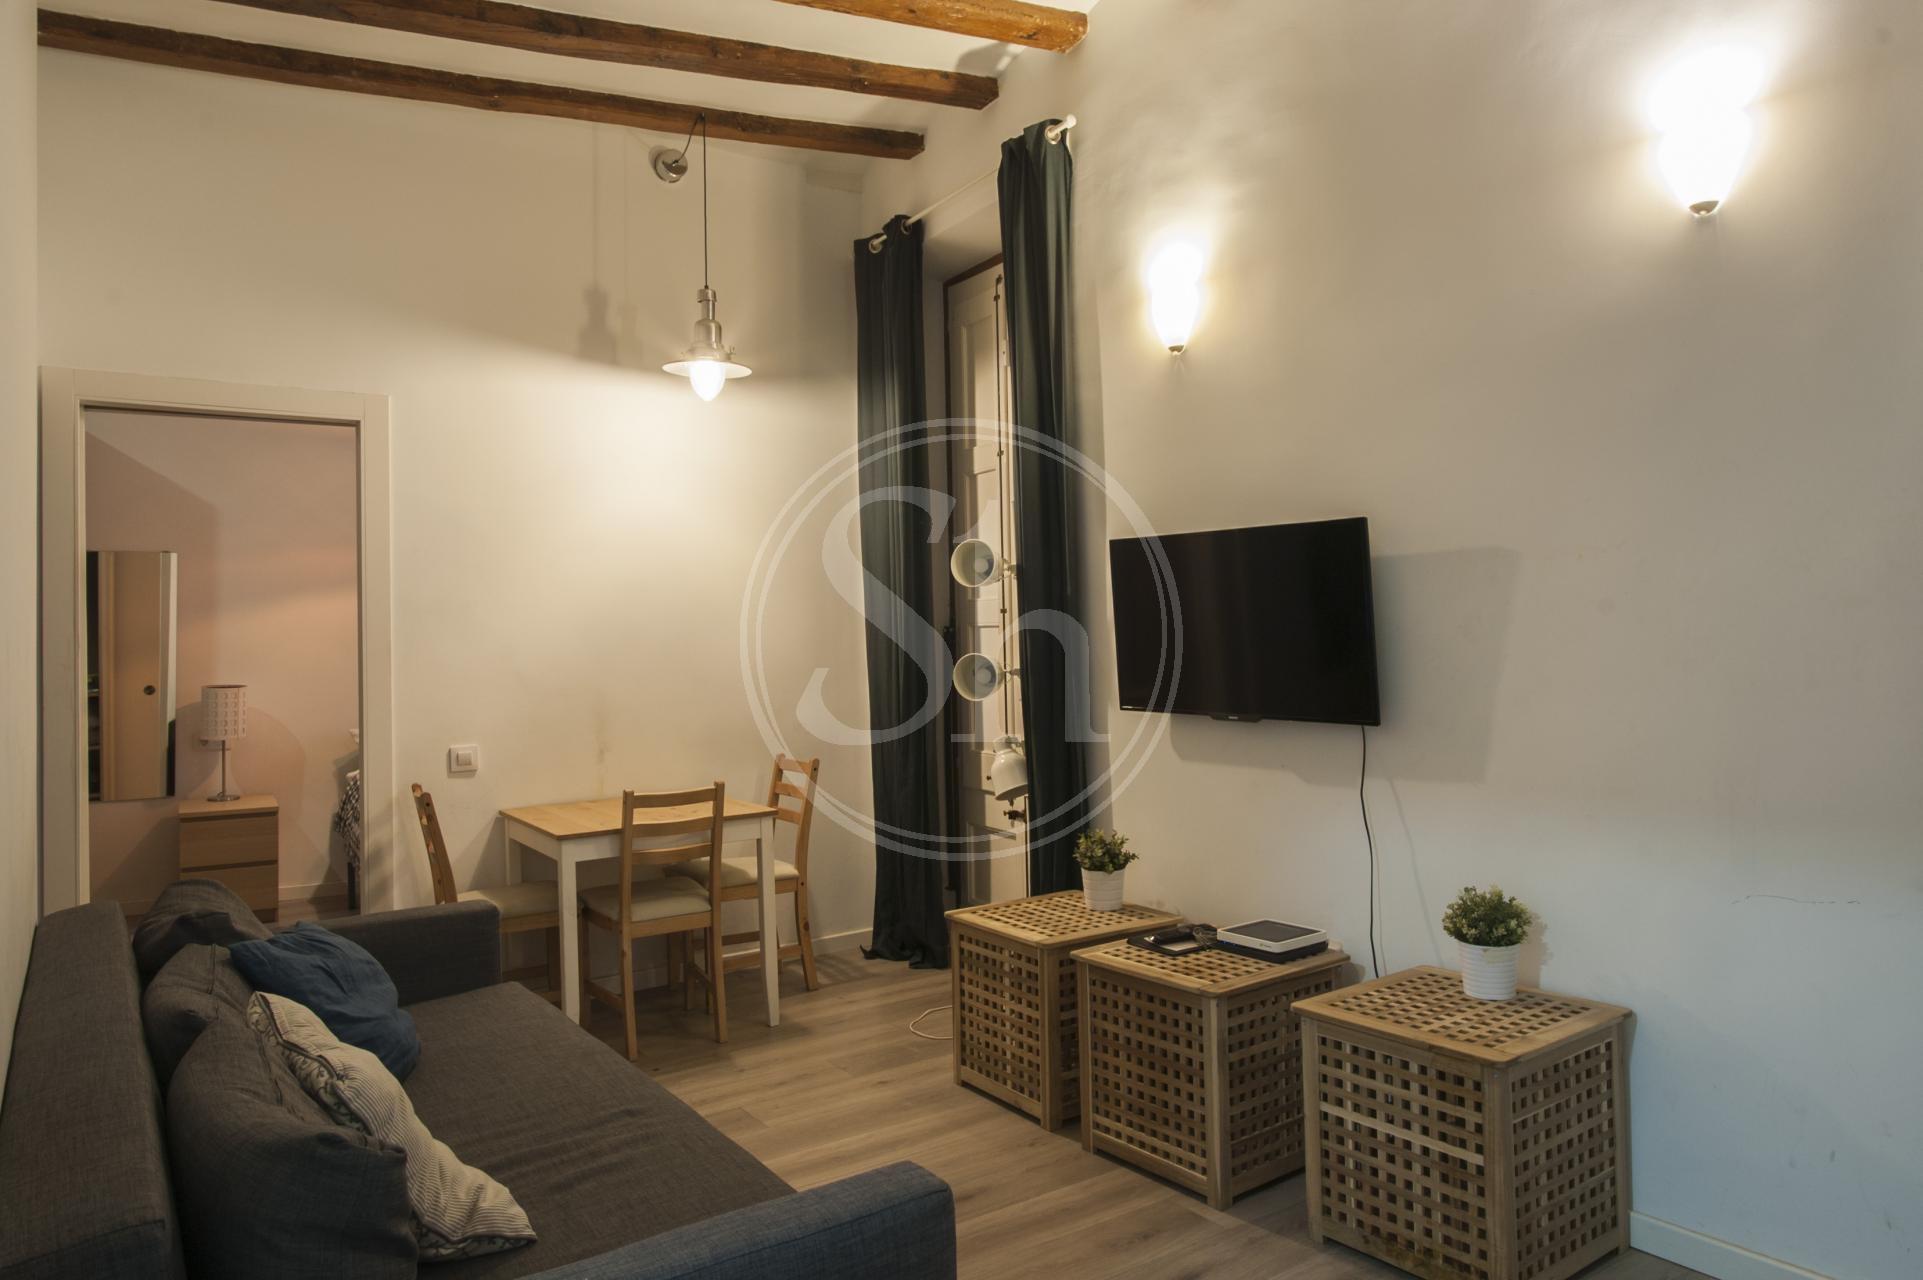 Appartamento in vendita a Barcelona Portal Nou - Basses De Sant Pere